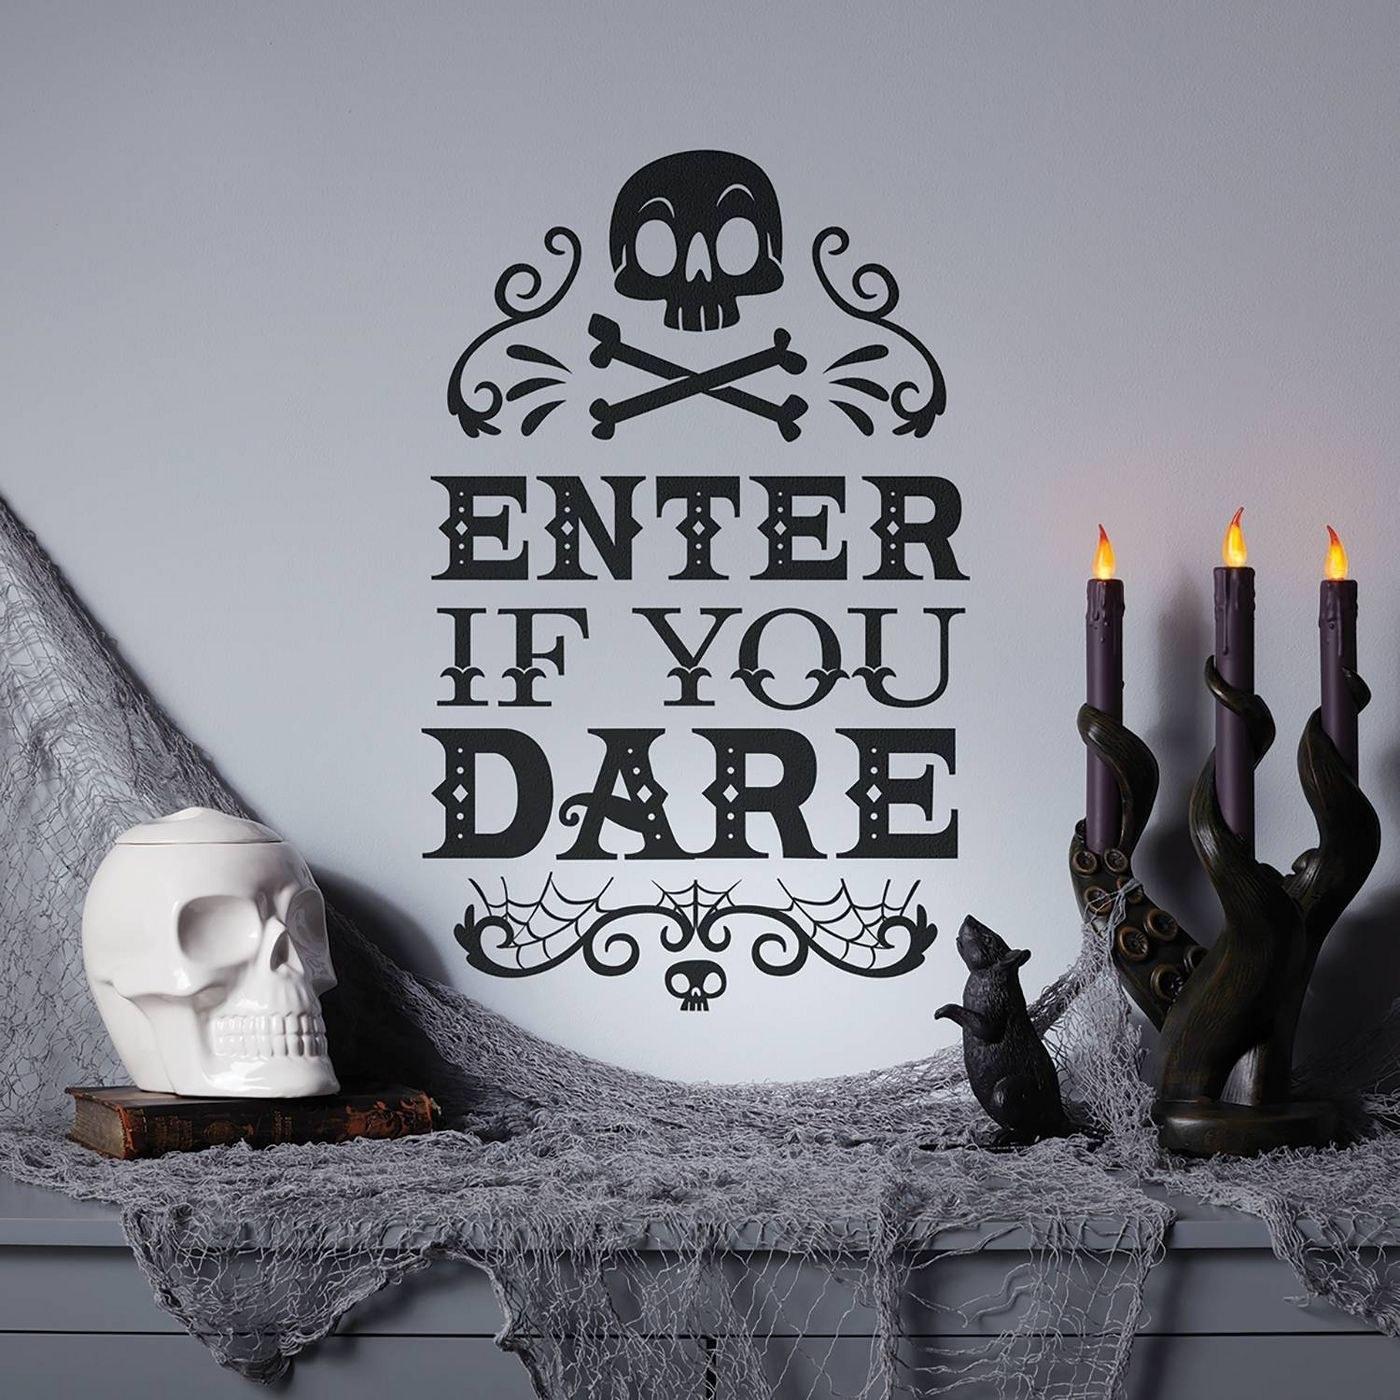 a halloween wall decal